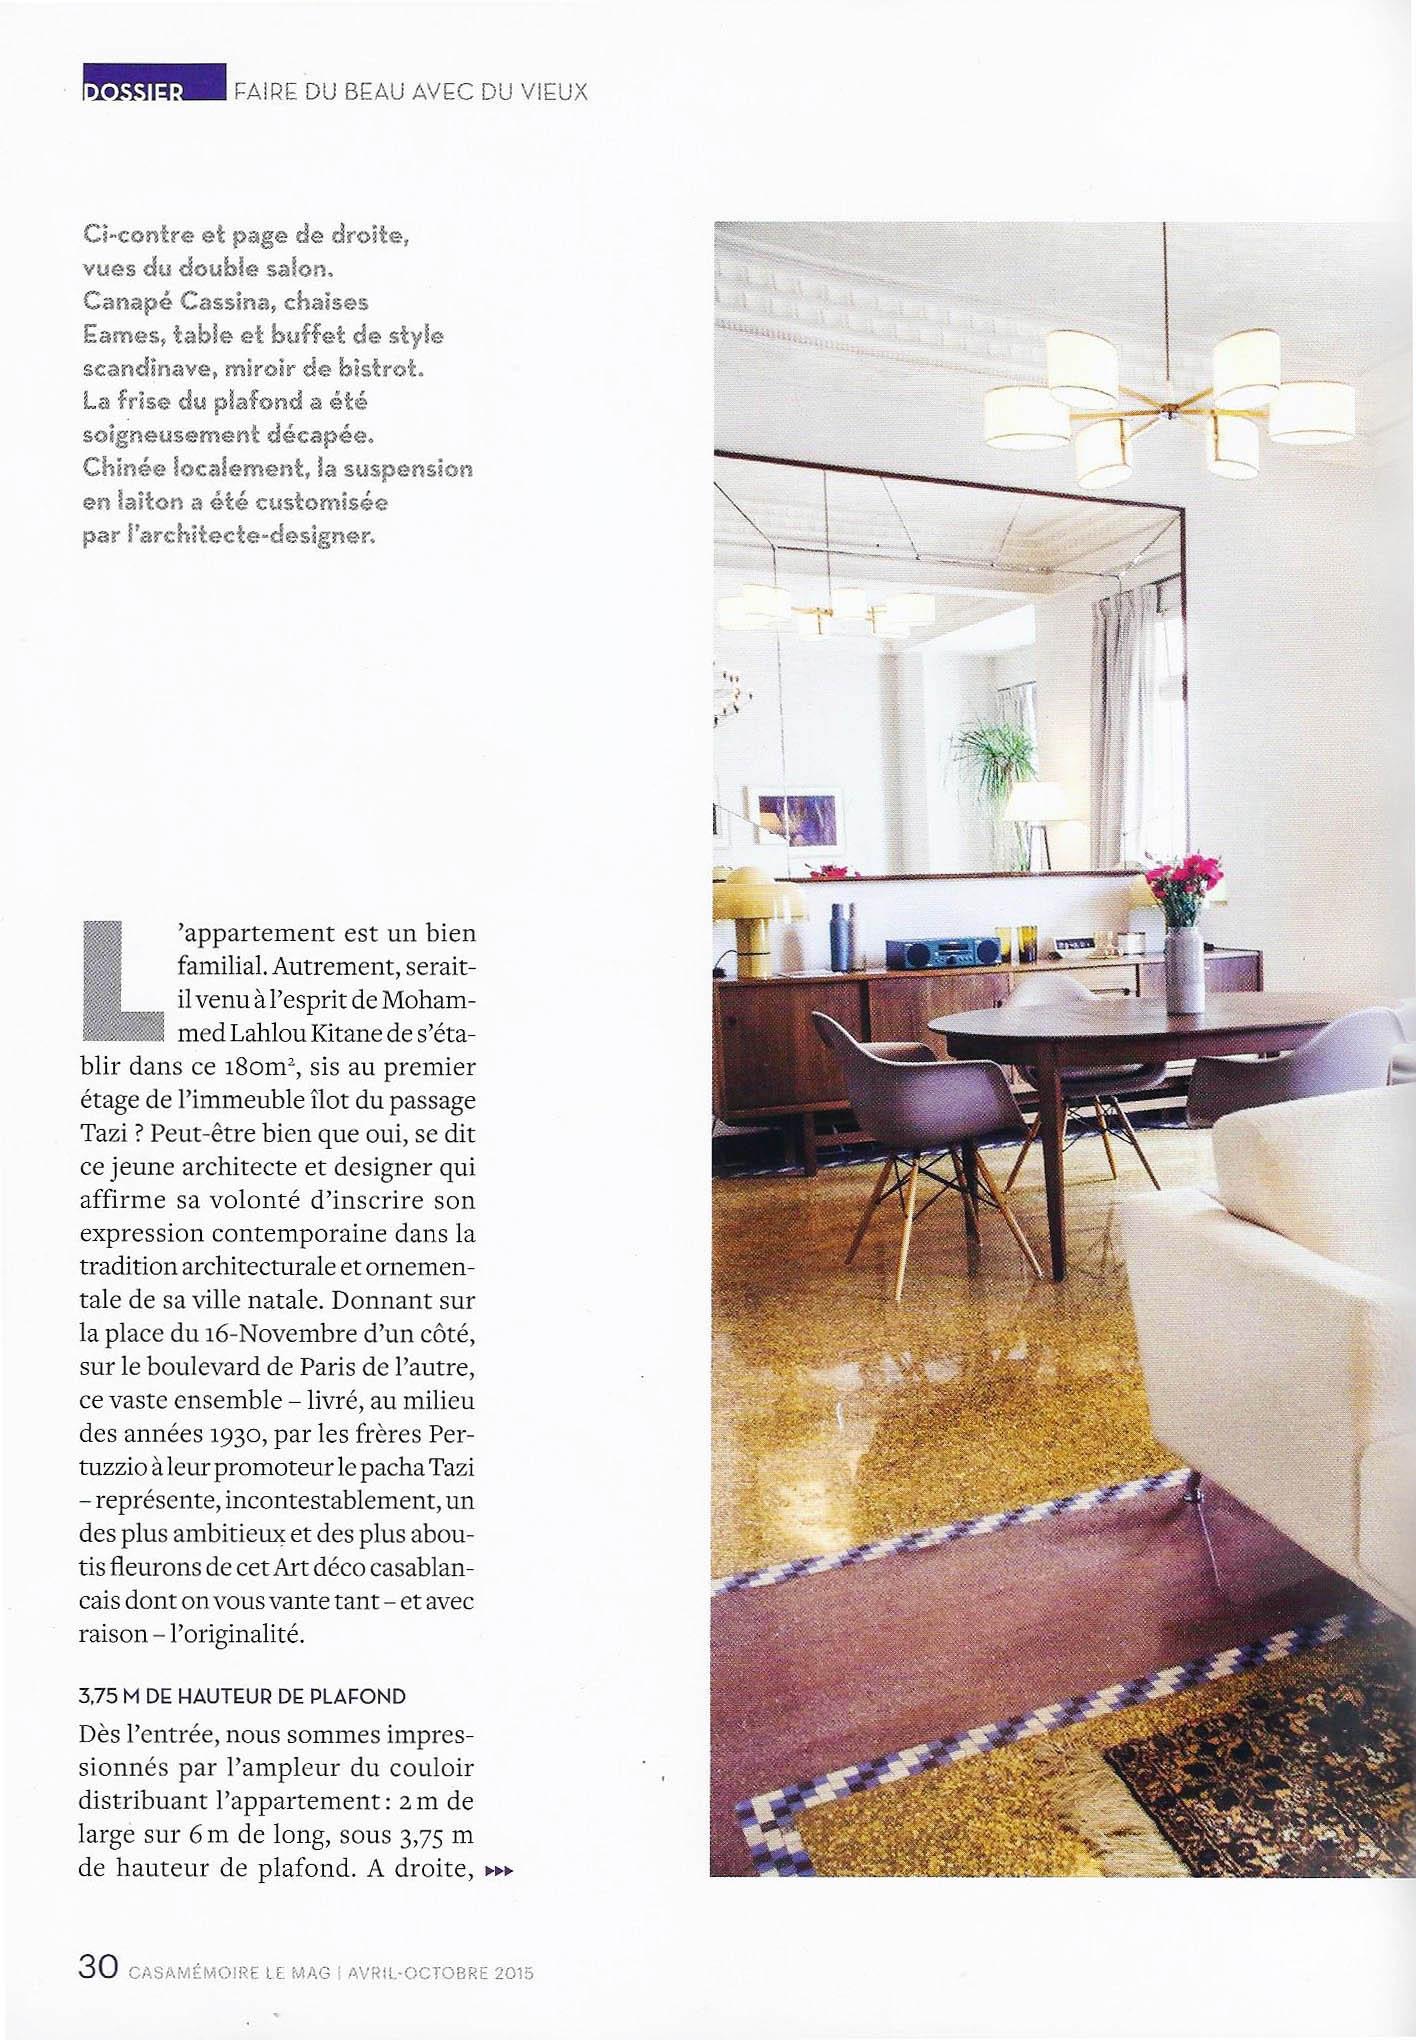 Suspension Hauteur Sous Plafond presse — mohamed lahlou kitane / mlk / architecture et design